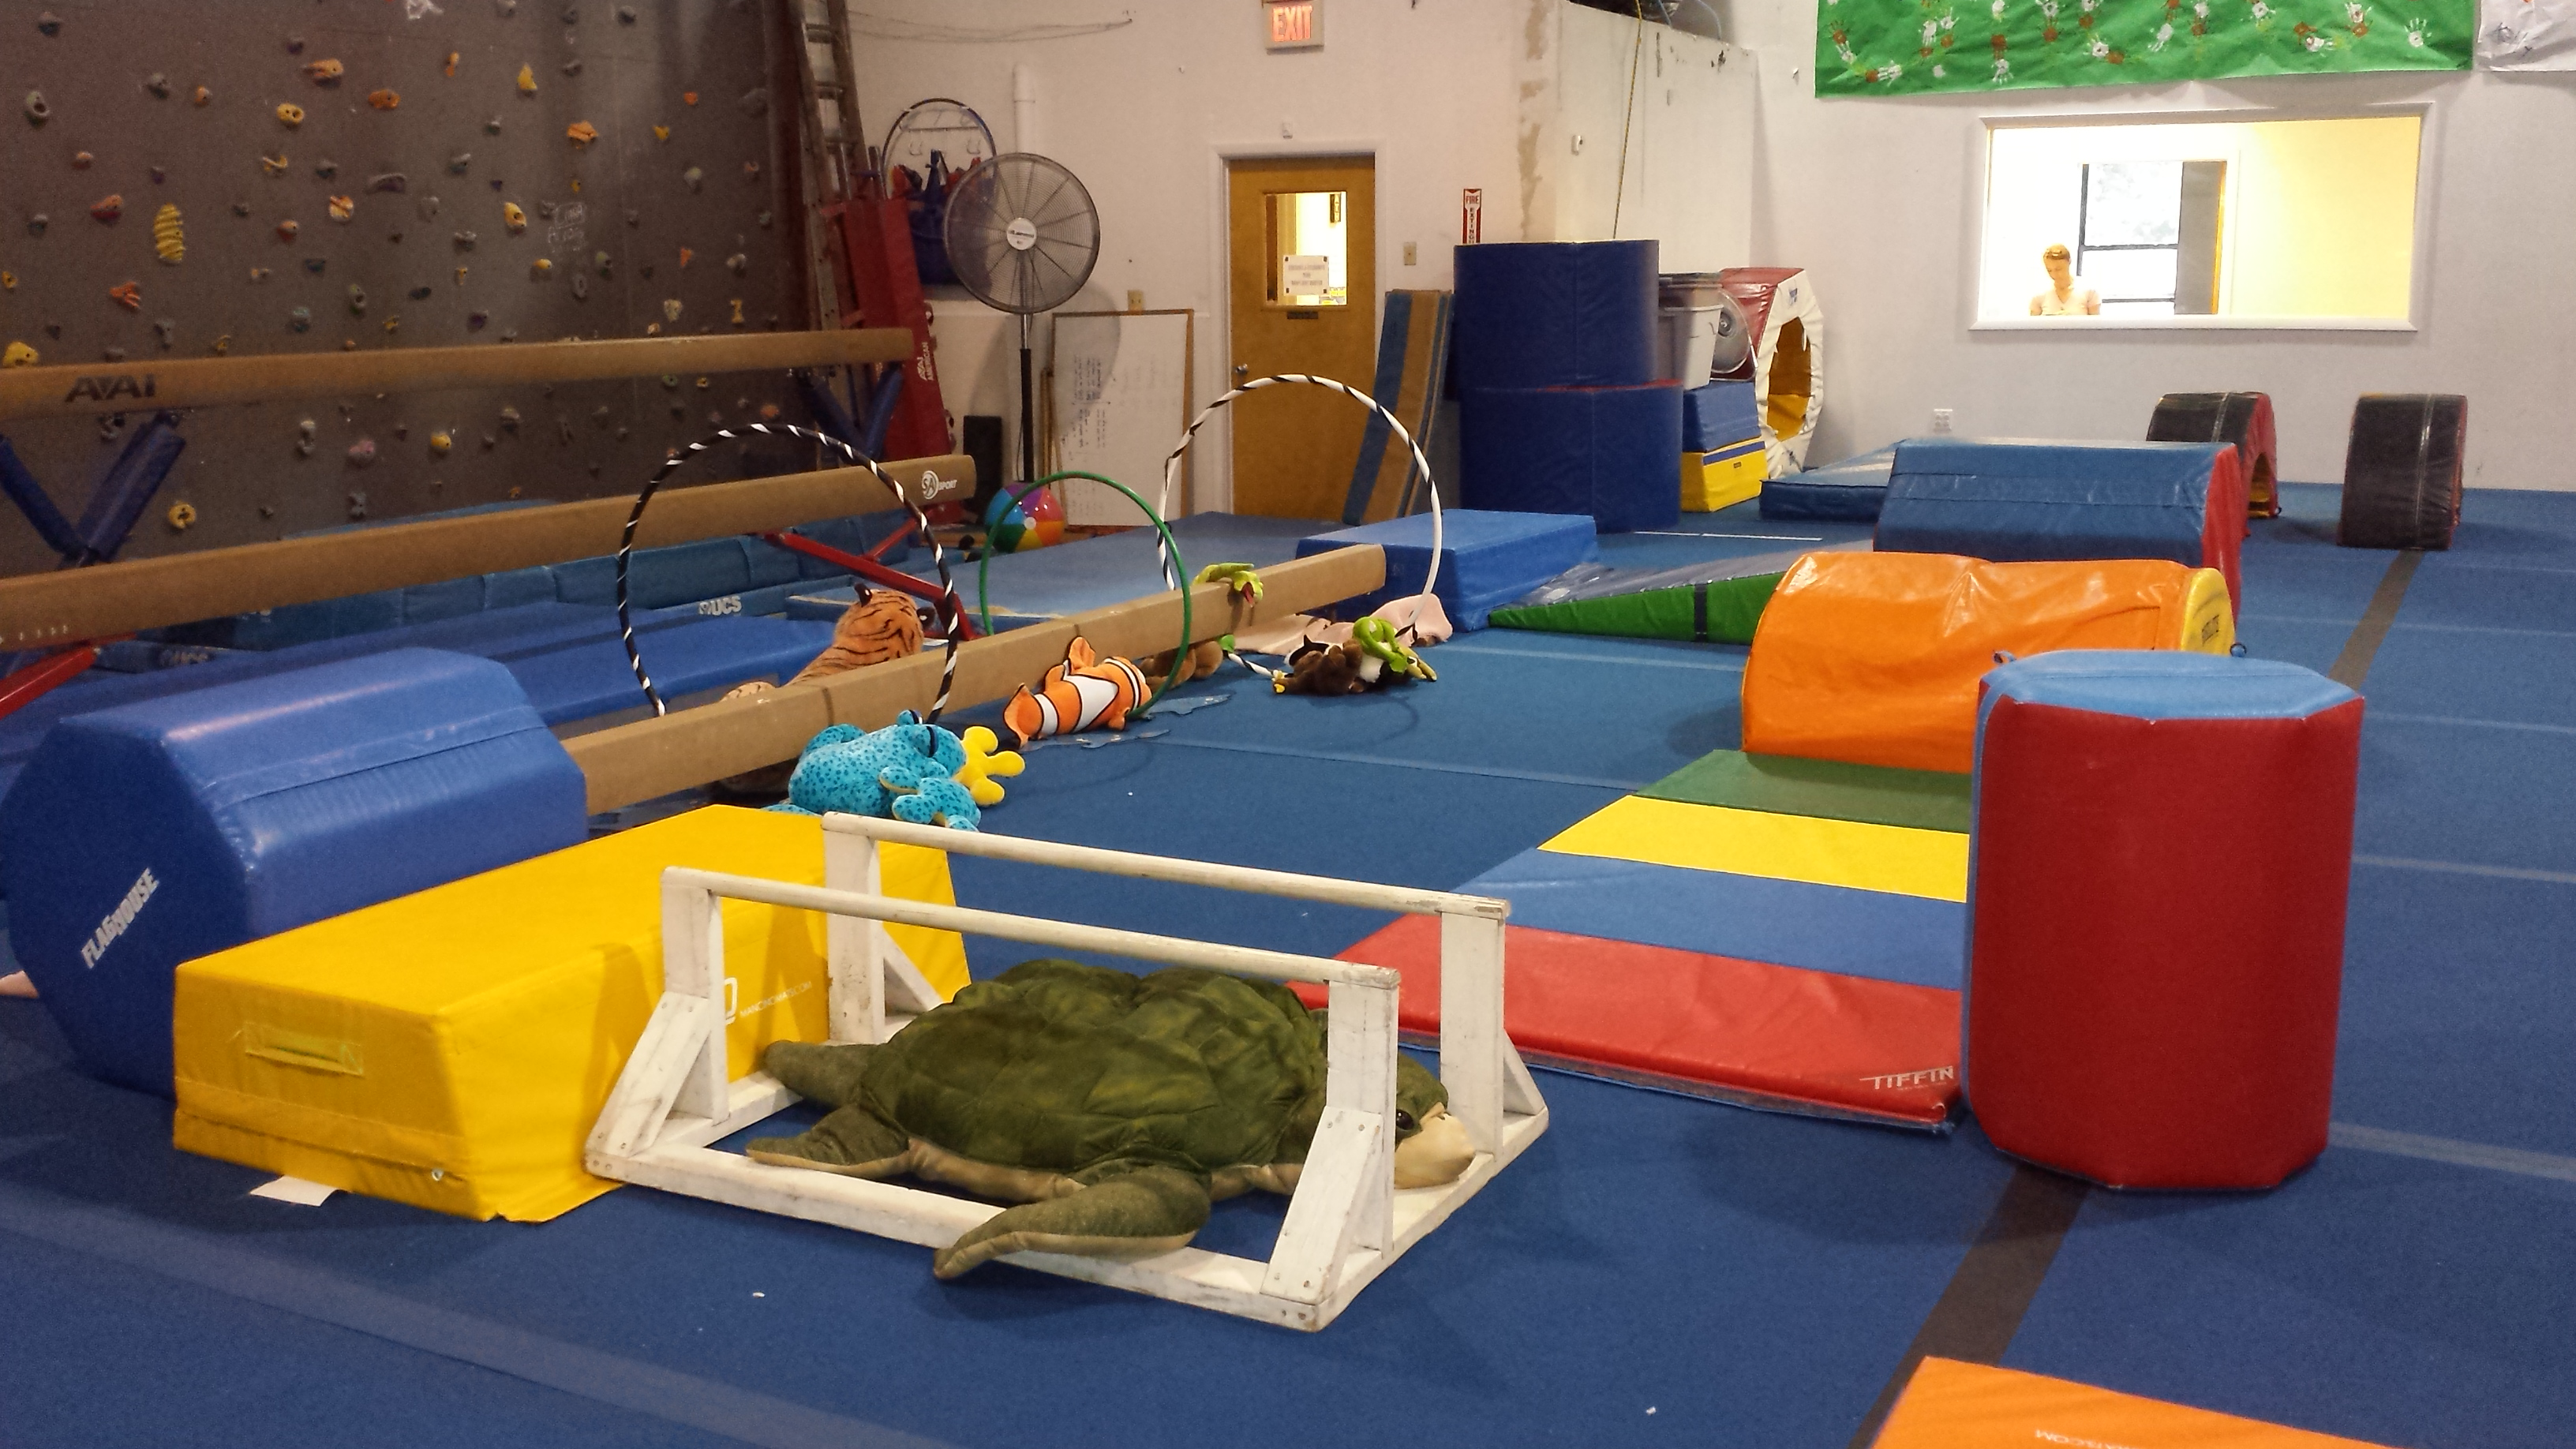 Kinderkidz preschool program giant gymnastics of sparta for Gross motor skills equipment